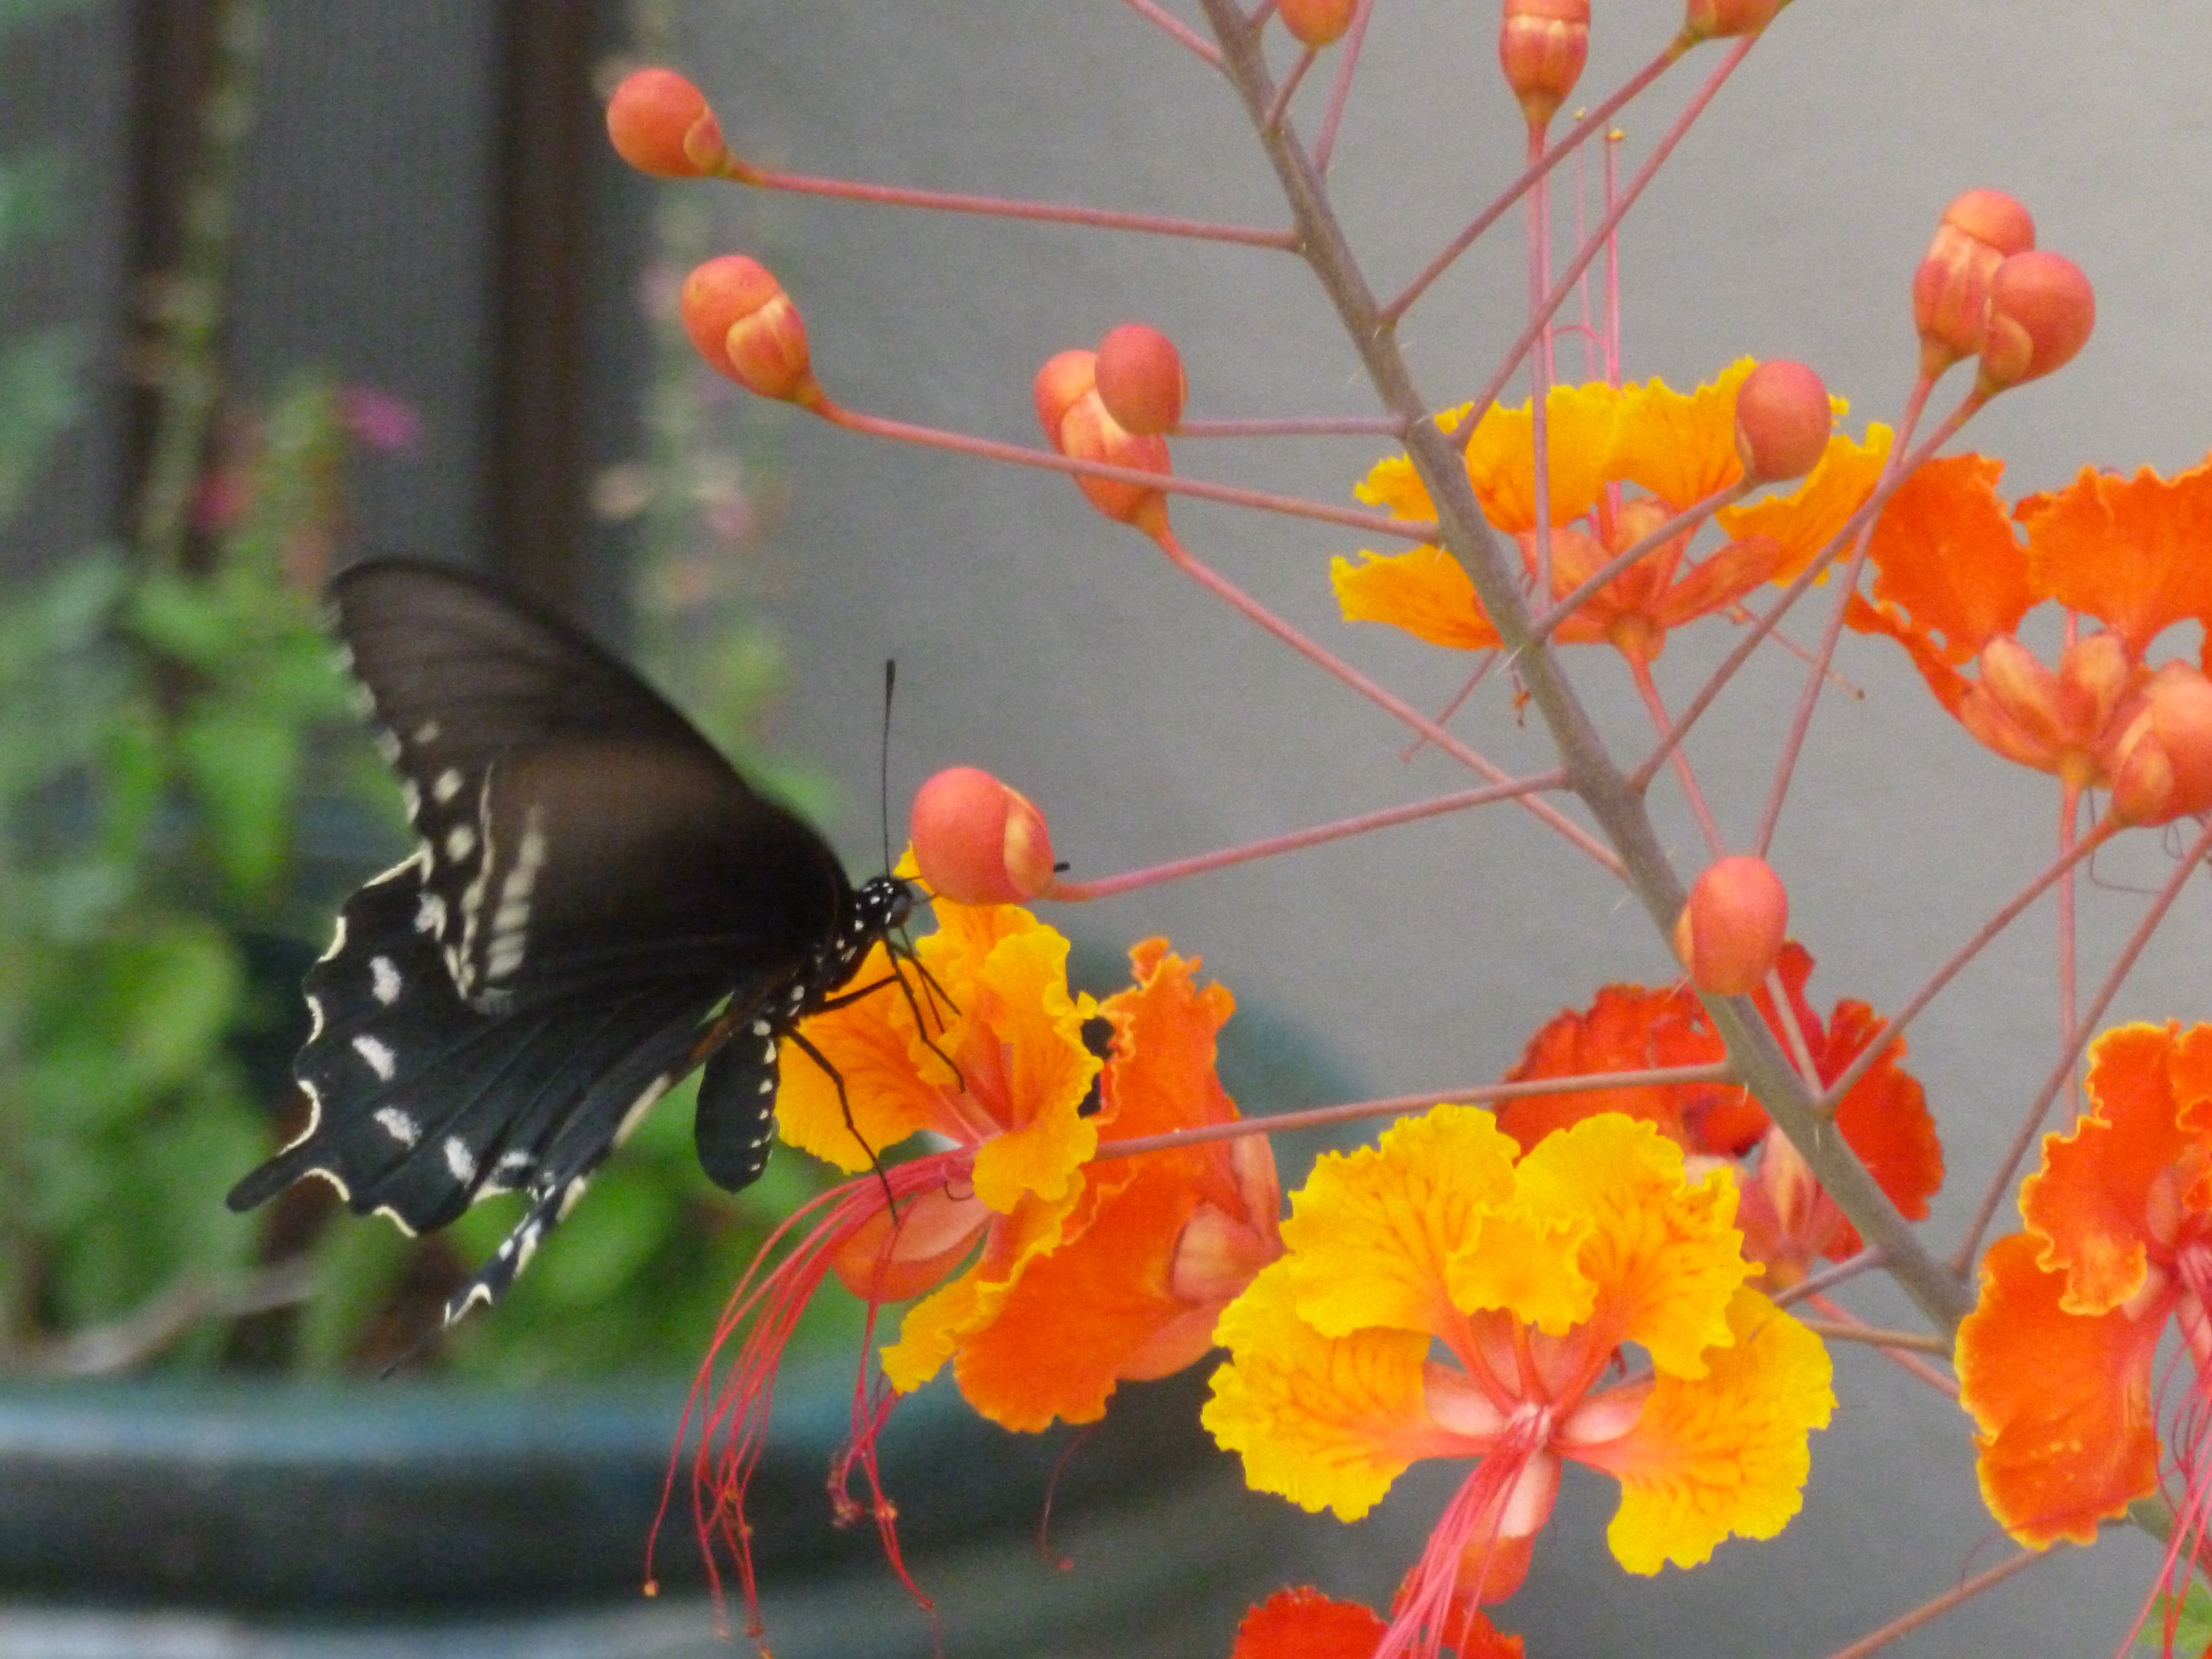 Plants Bush With Red Orange And Yellow Flowers In Arizona Bird Of